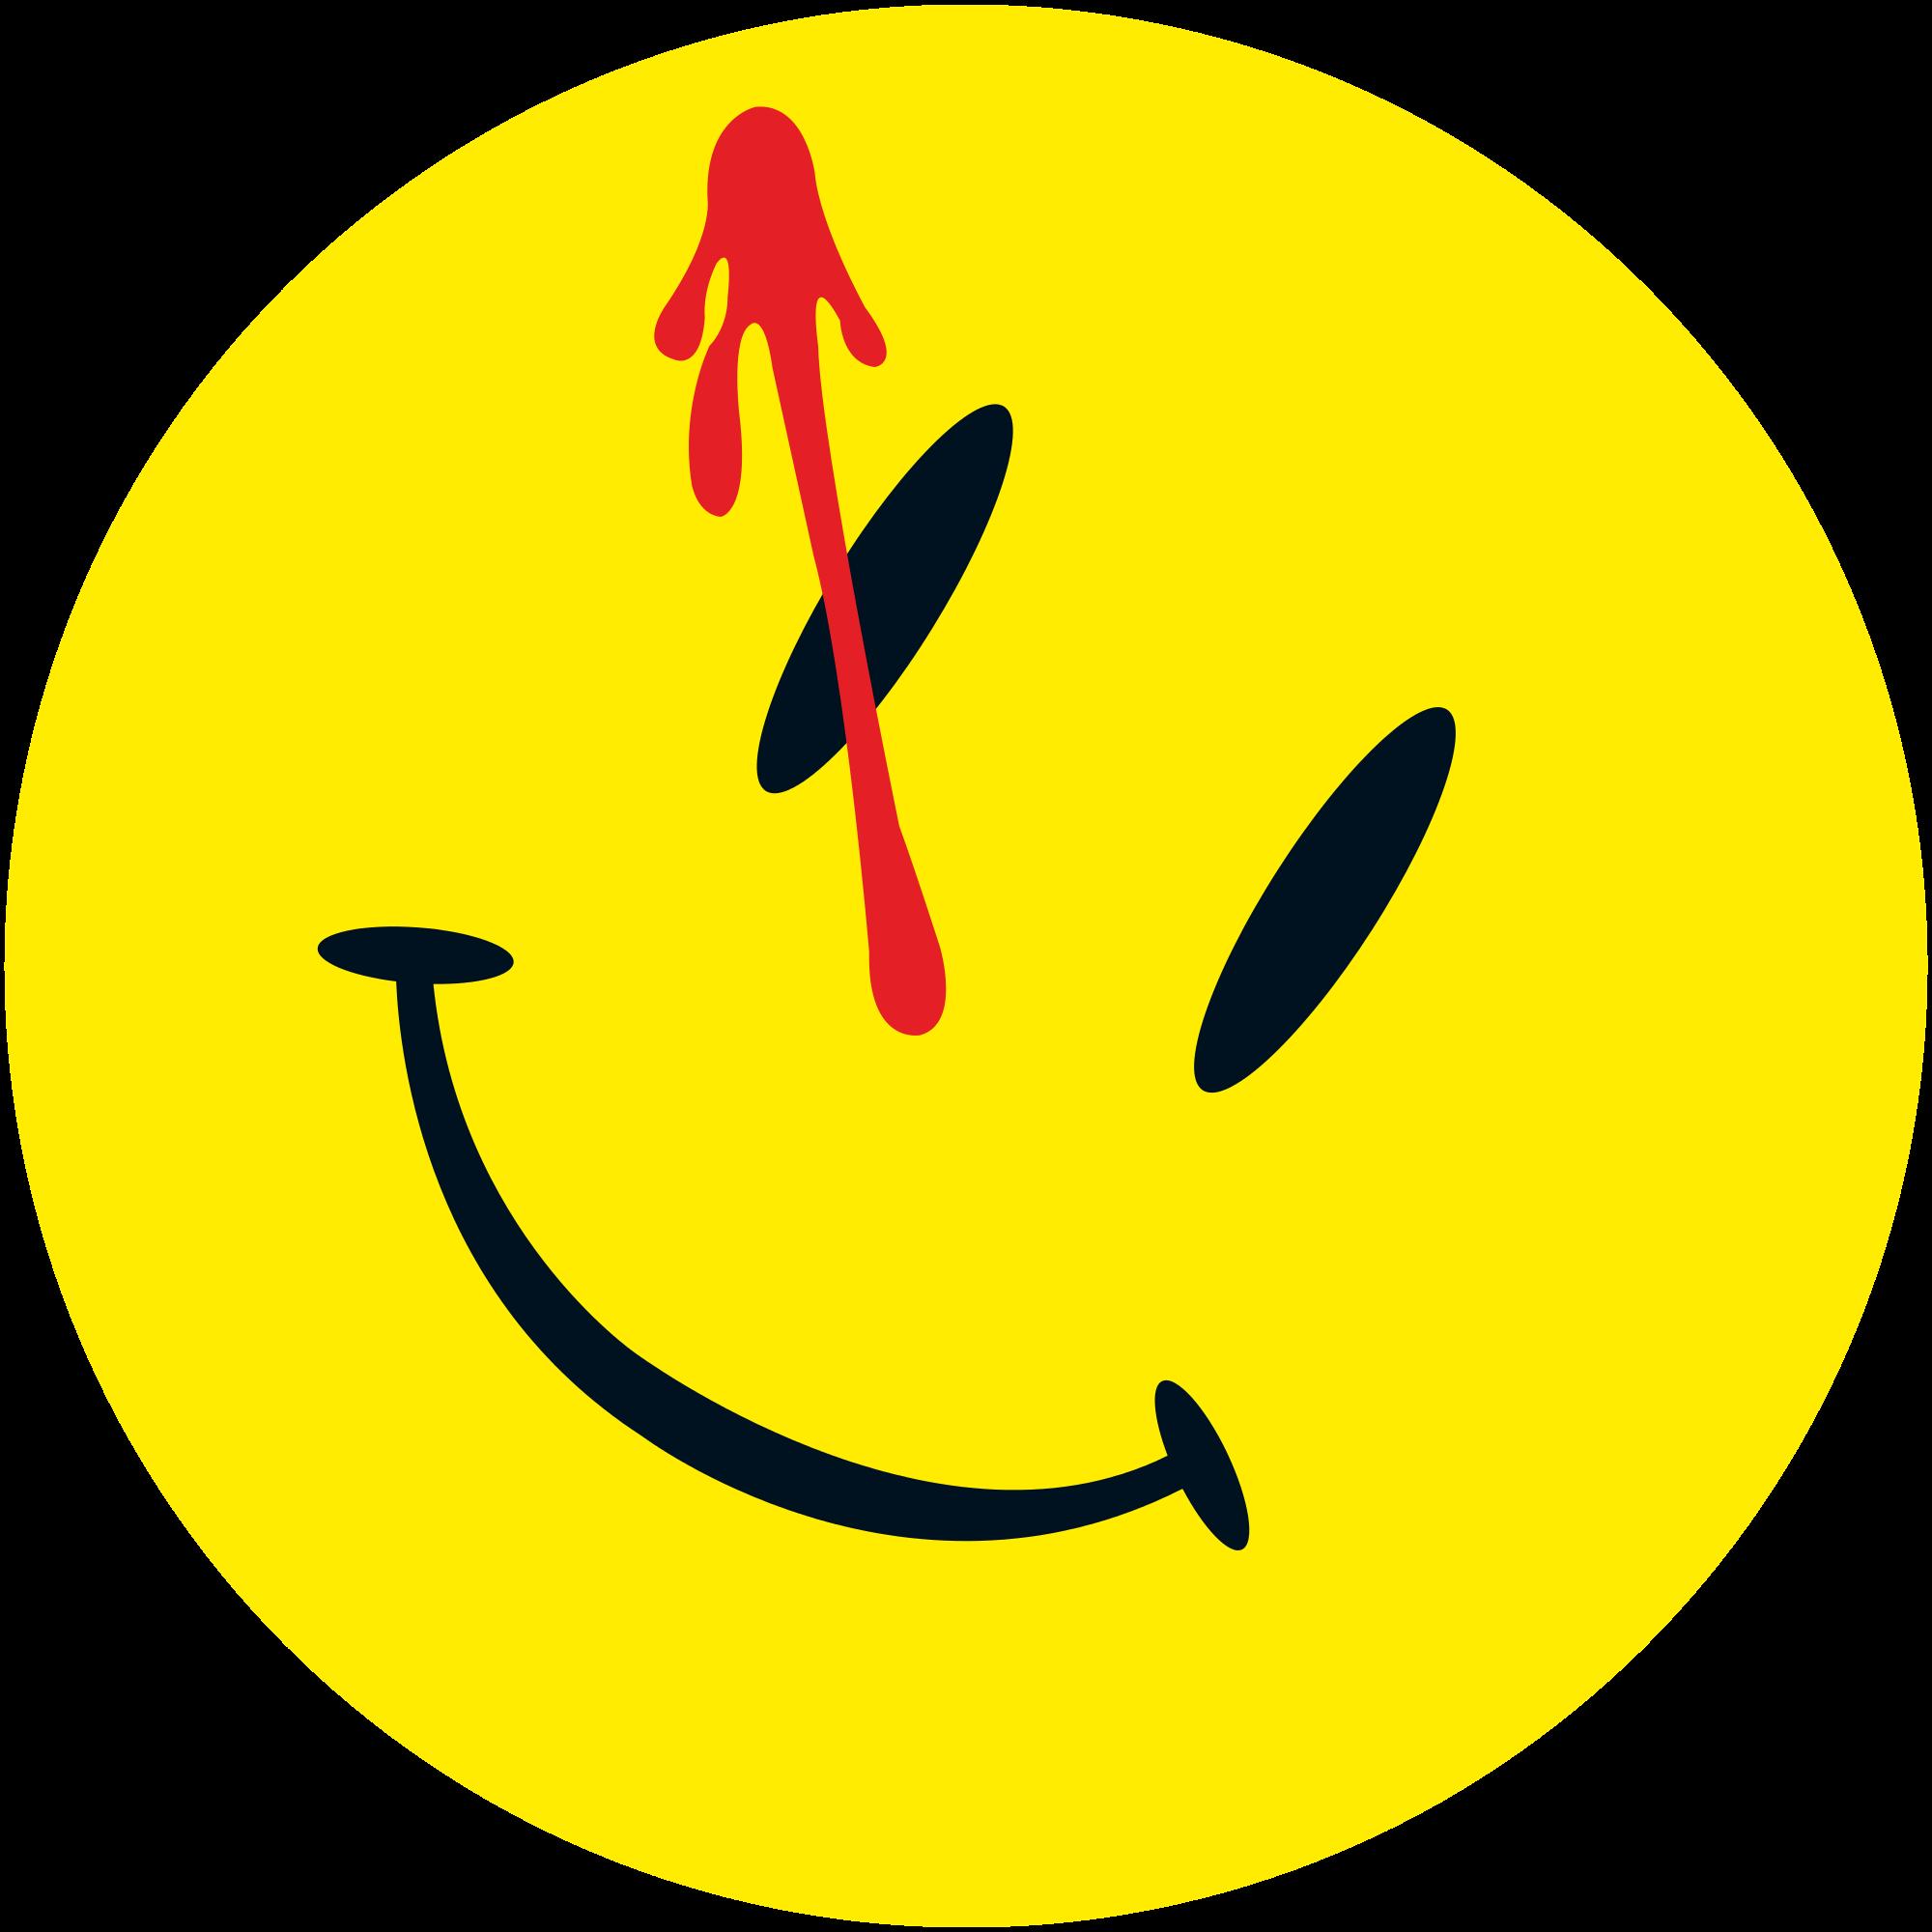 Smiley svg, Download Smiley svg for free 2019 - Free Smiley Face Svg File